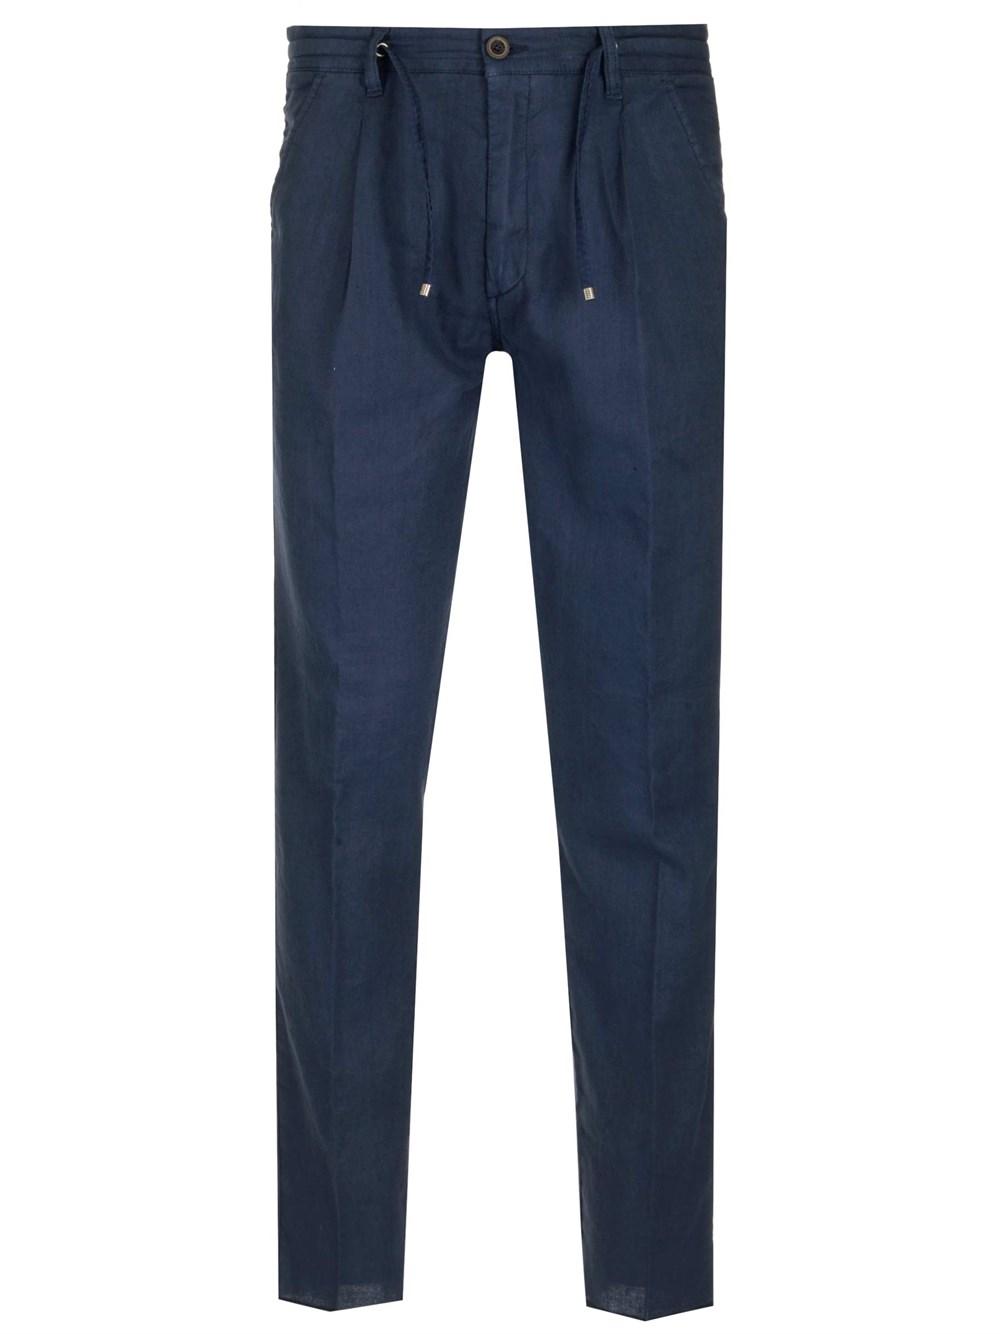 AL DUCA D'AOSTA 1902 Drawstring-Waist Cotton-Blend Trousers